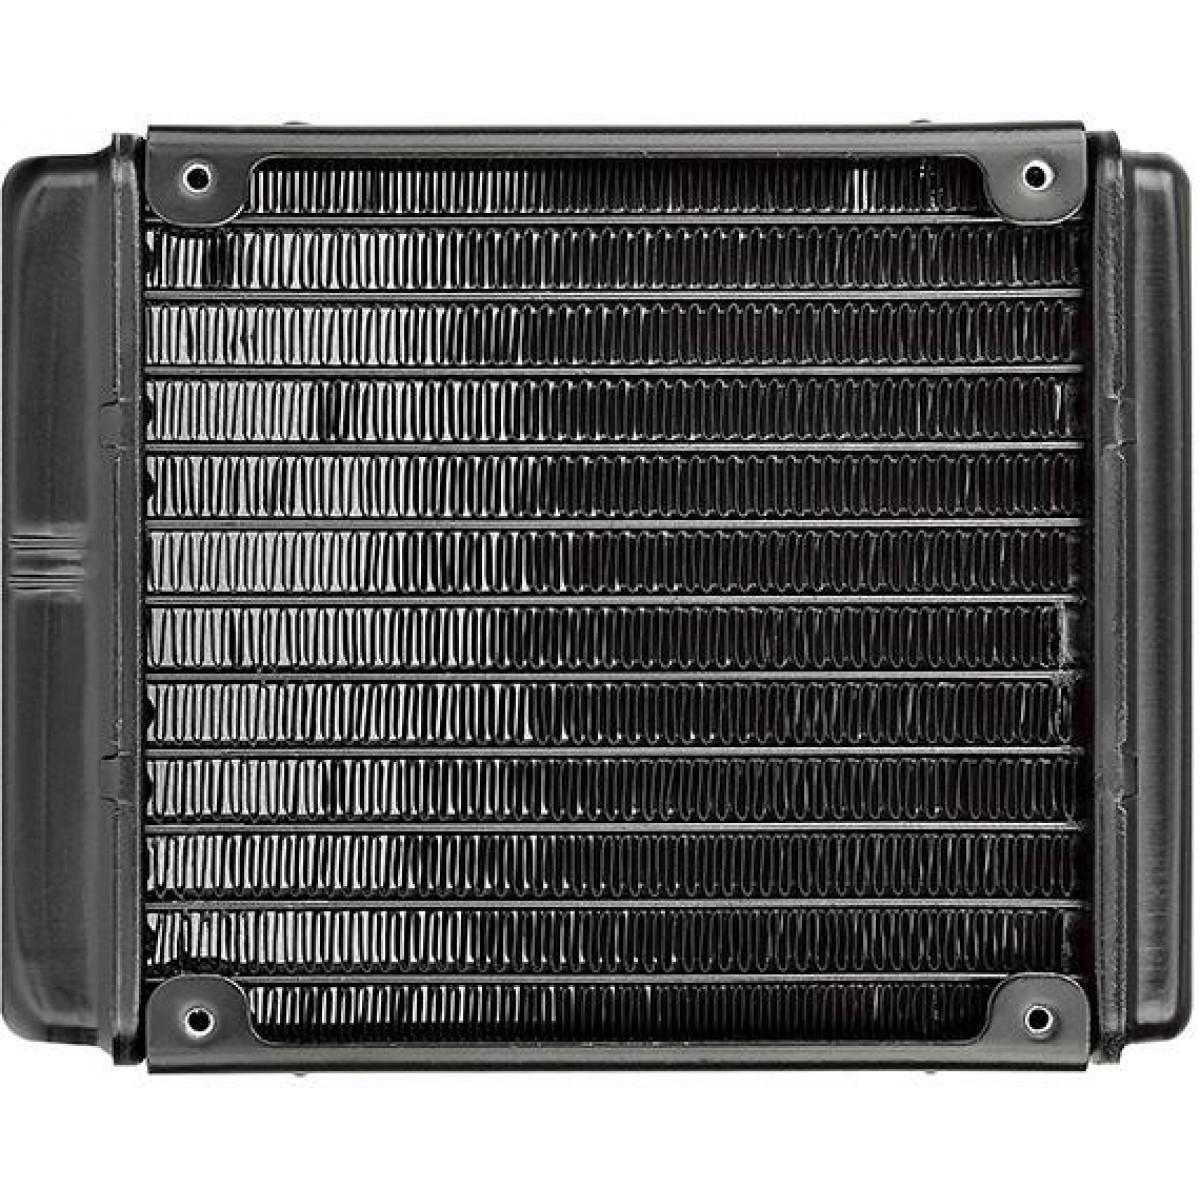 Water Cooler Thermaltake 3.0, ARGB Sync 120mm, Intel/AMD, CL-W232-PL12SW-B